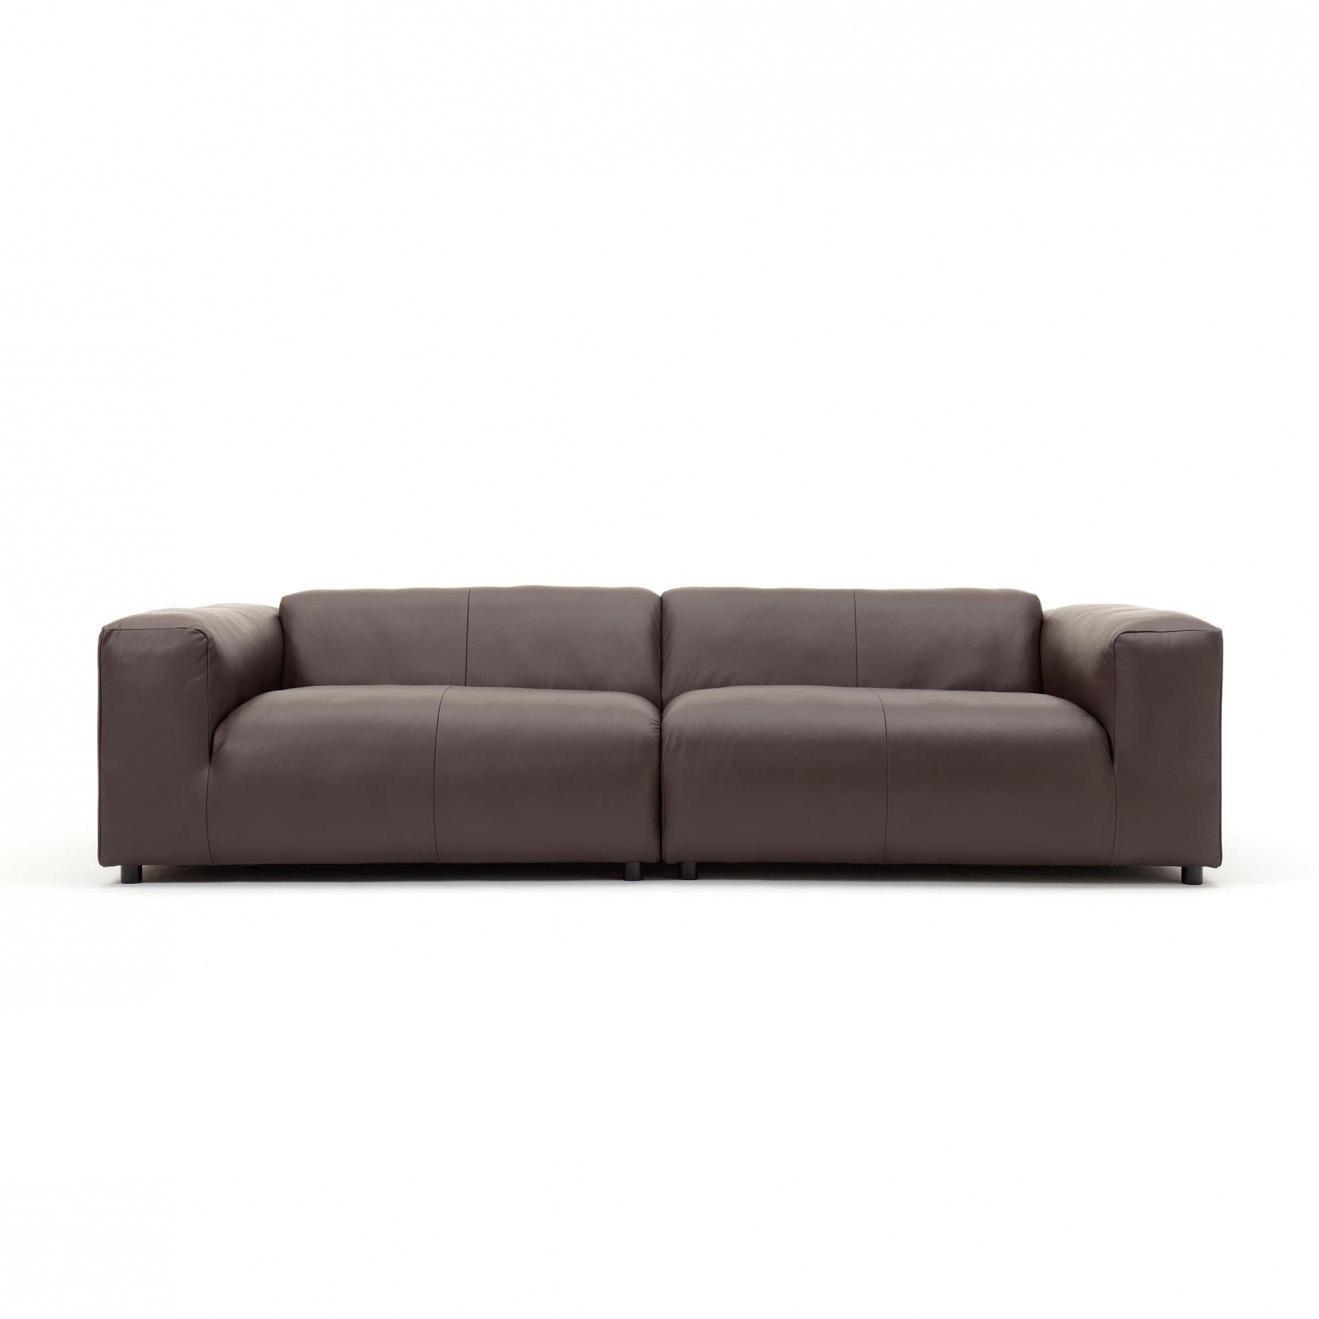 rolf benz freistil sofa no 180 bradington truffle review 187 3 seater leather ambientedirect 300x67x110cm